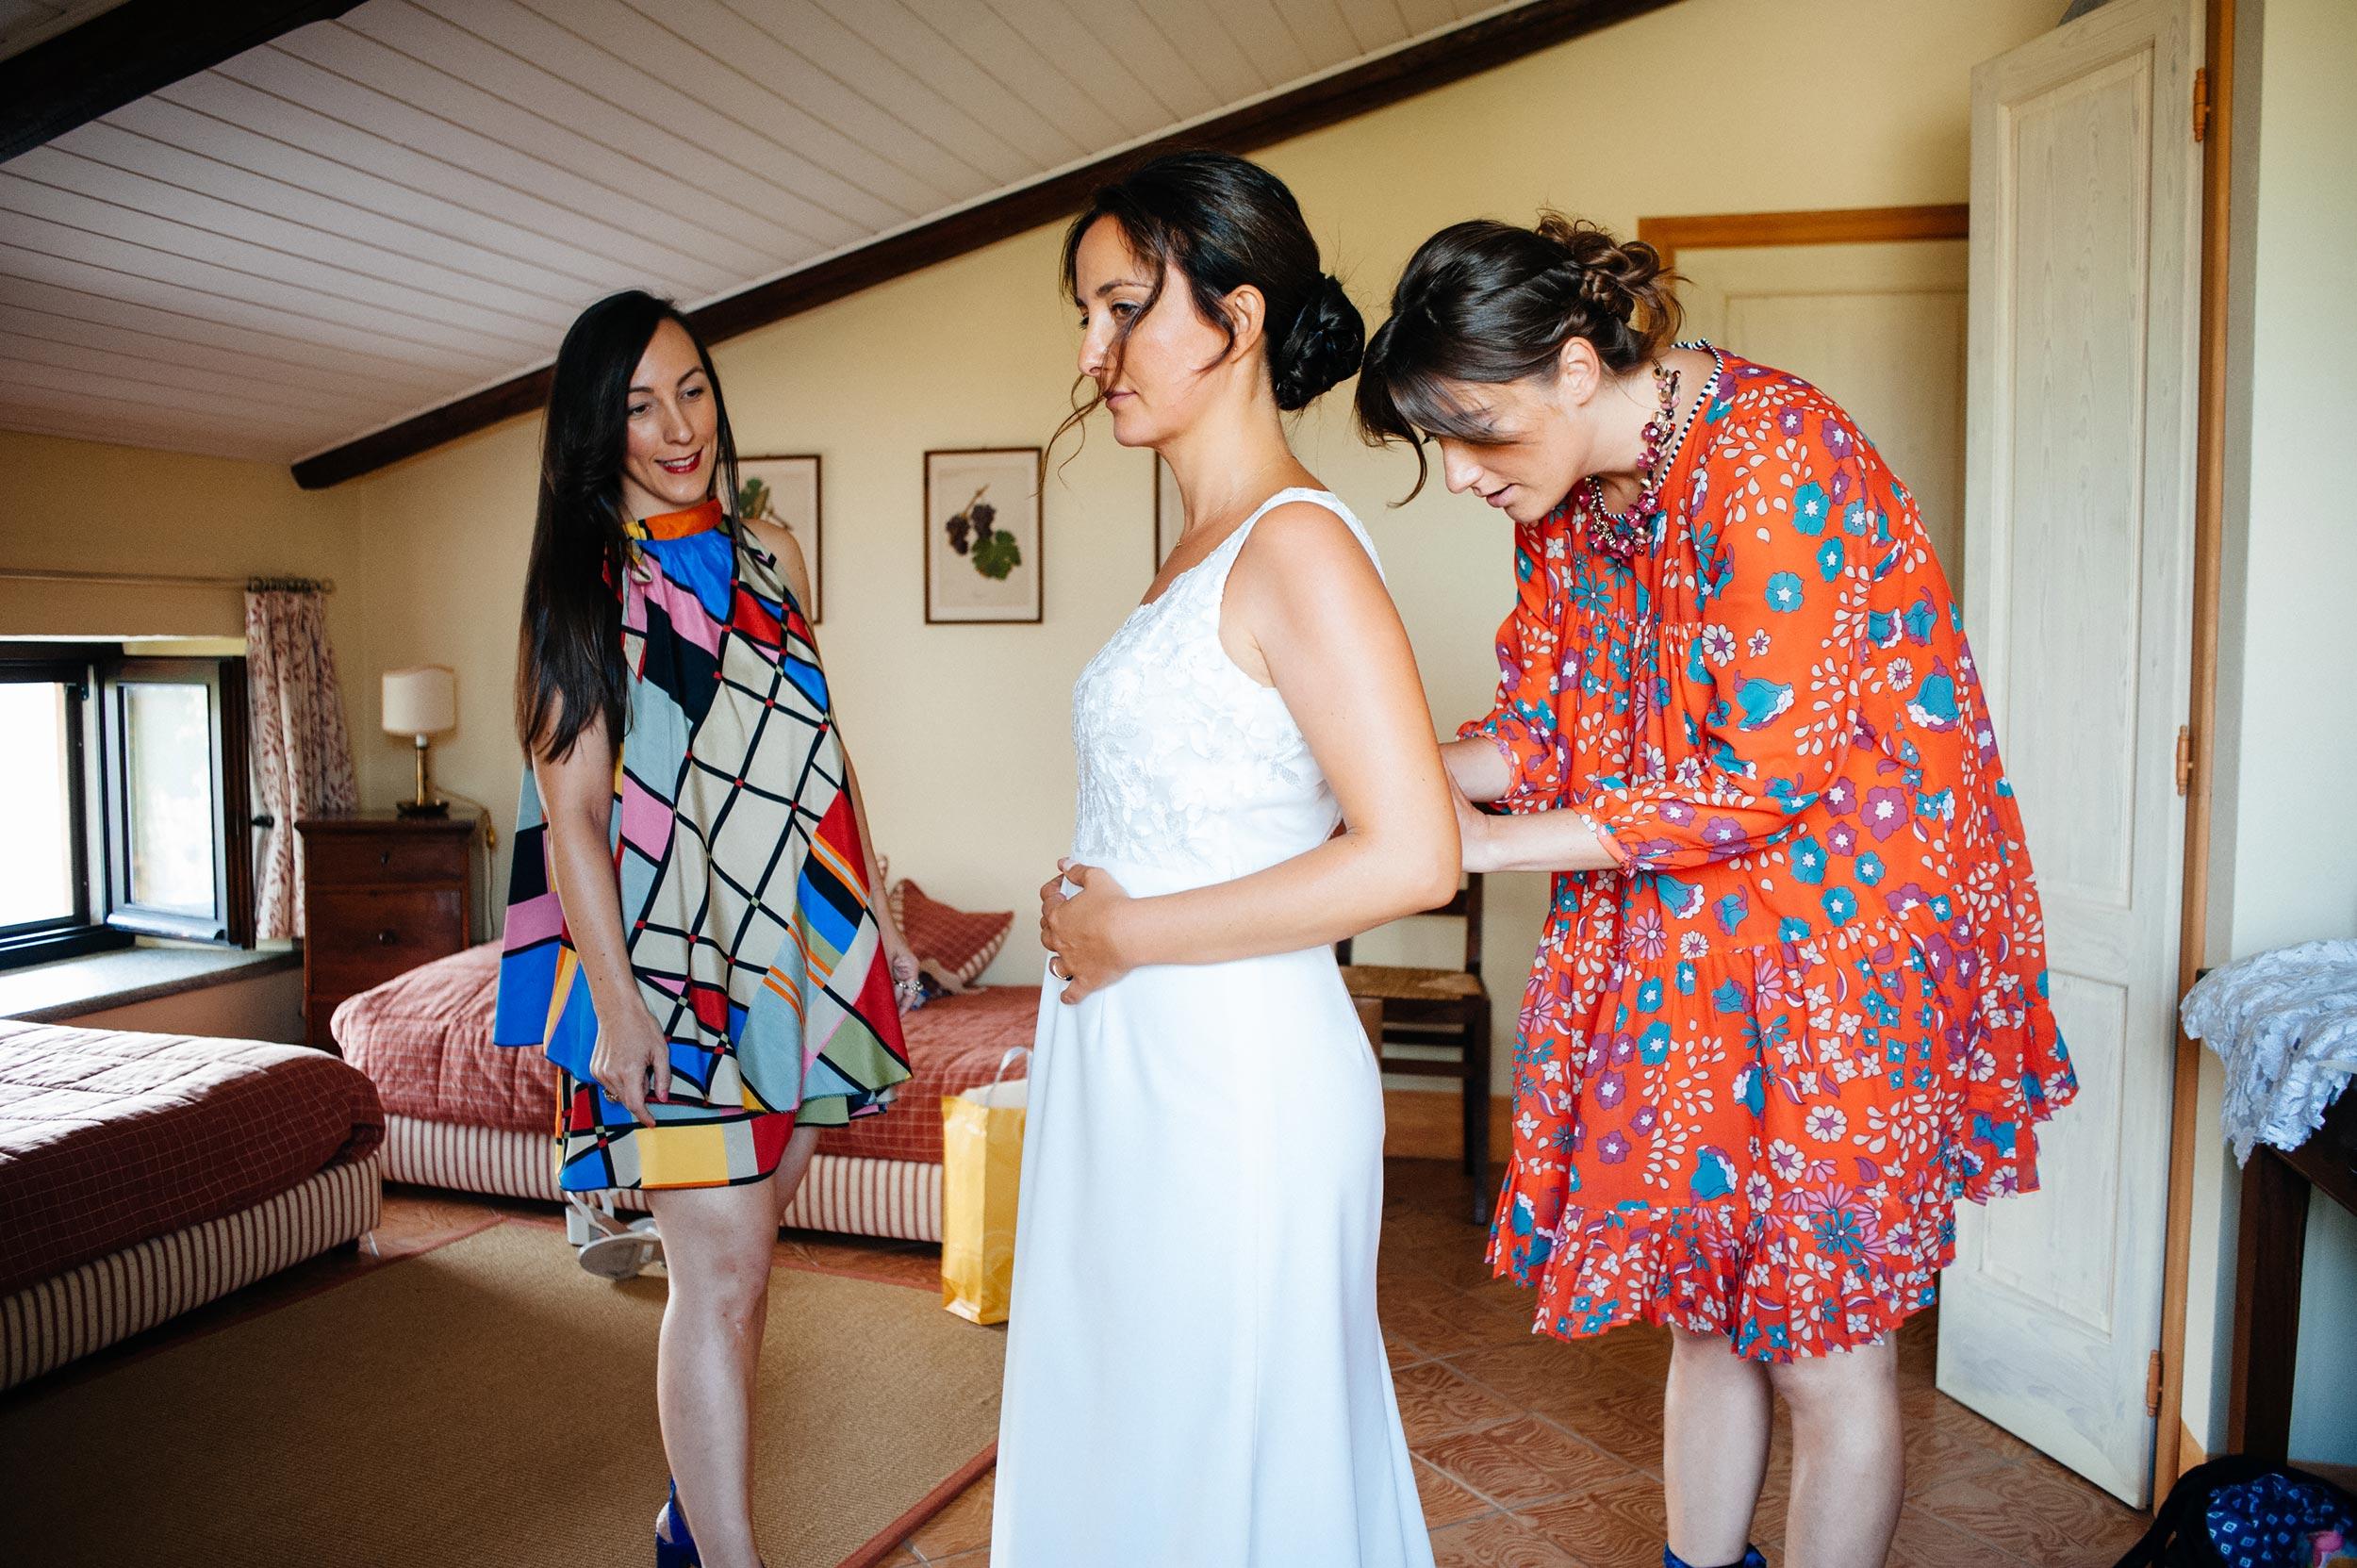 2016-Davor-Chiara-Monferrato-Asti-Vercelli-Wedding-Photographer-Italy-Alessandro-Avenali-17.jpg